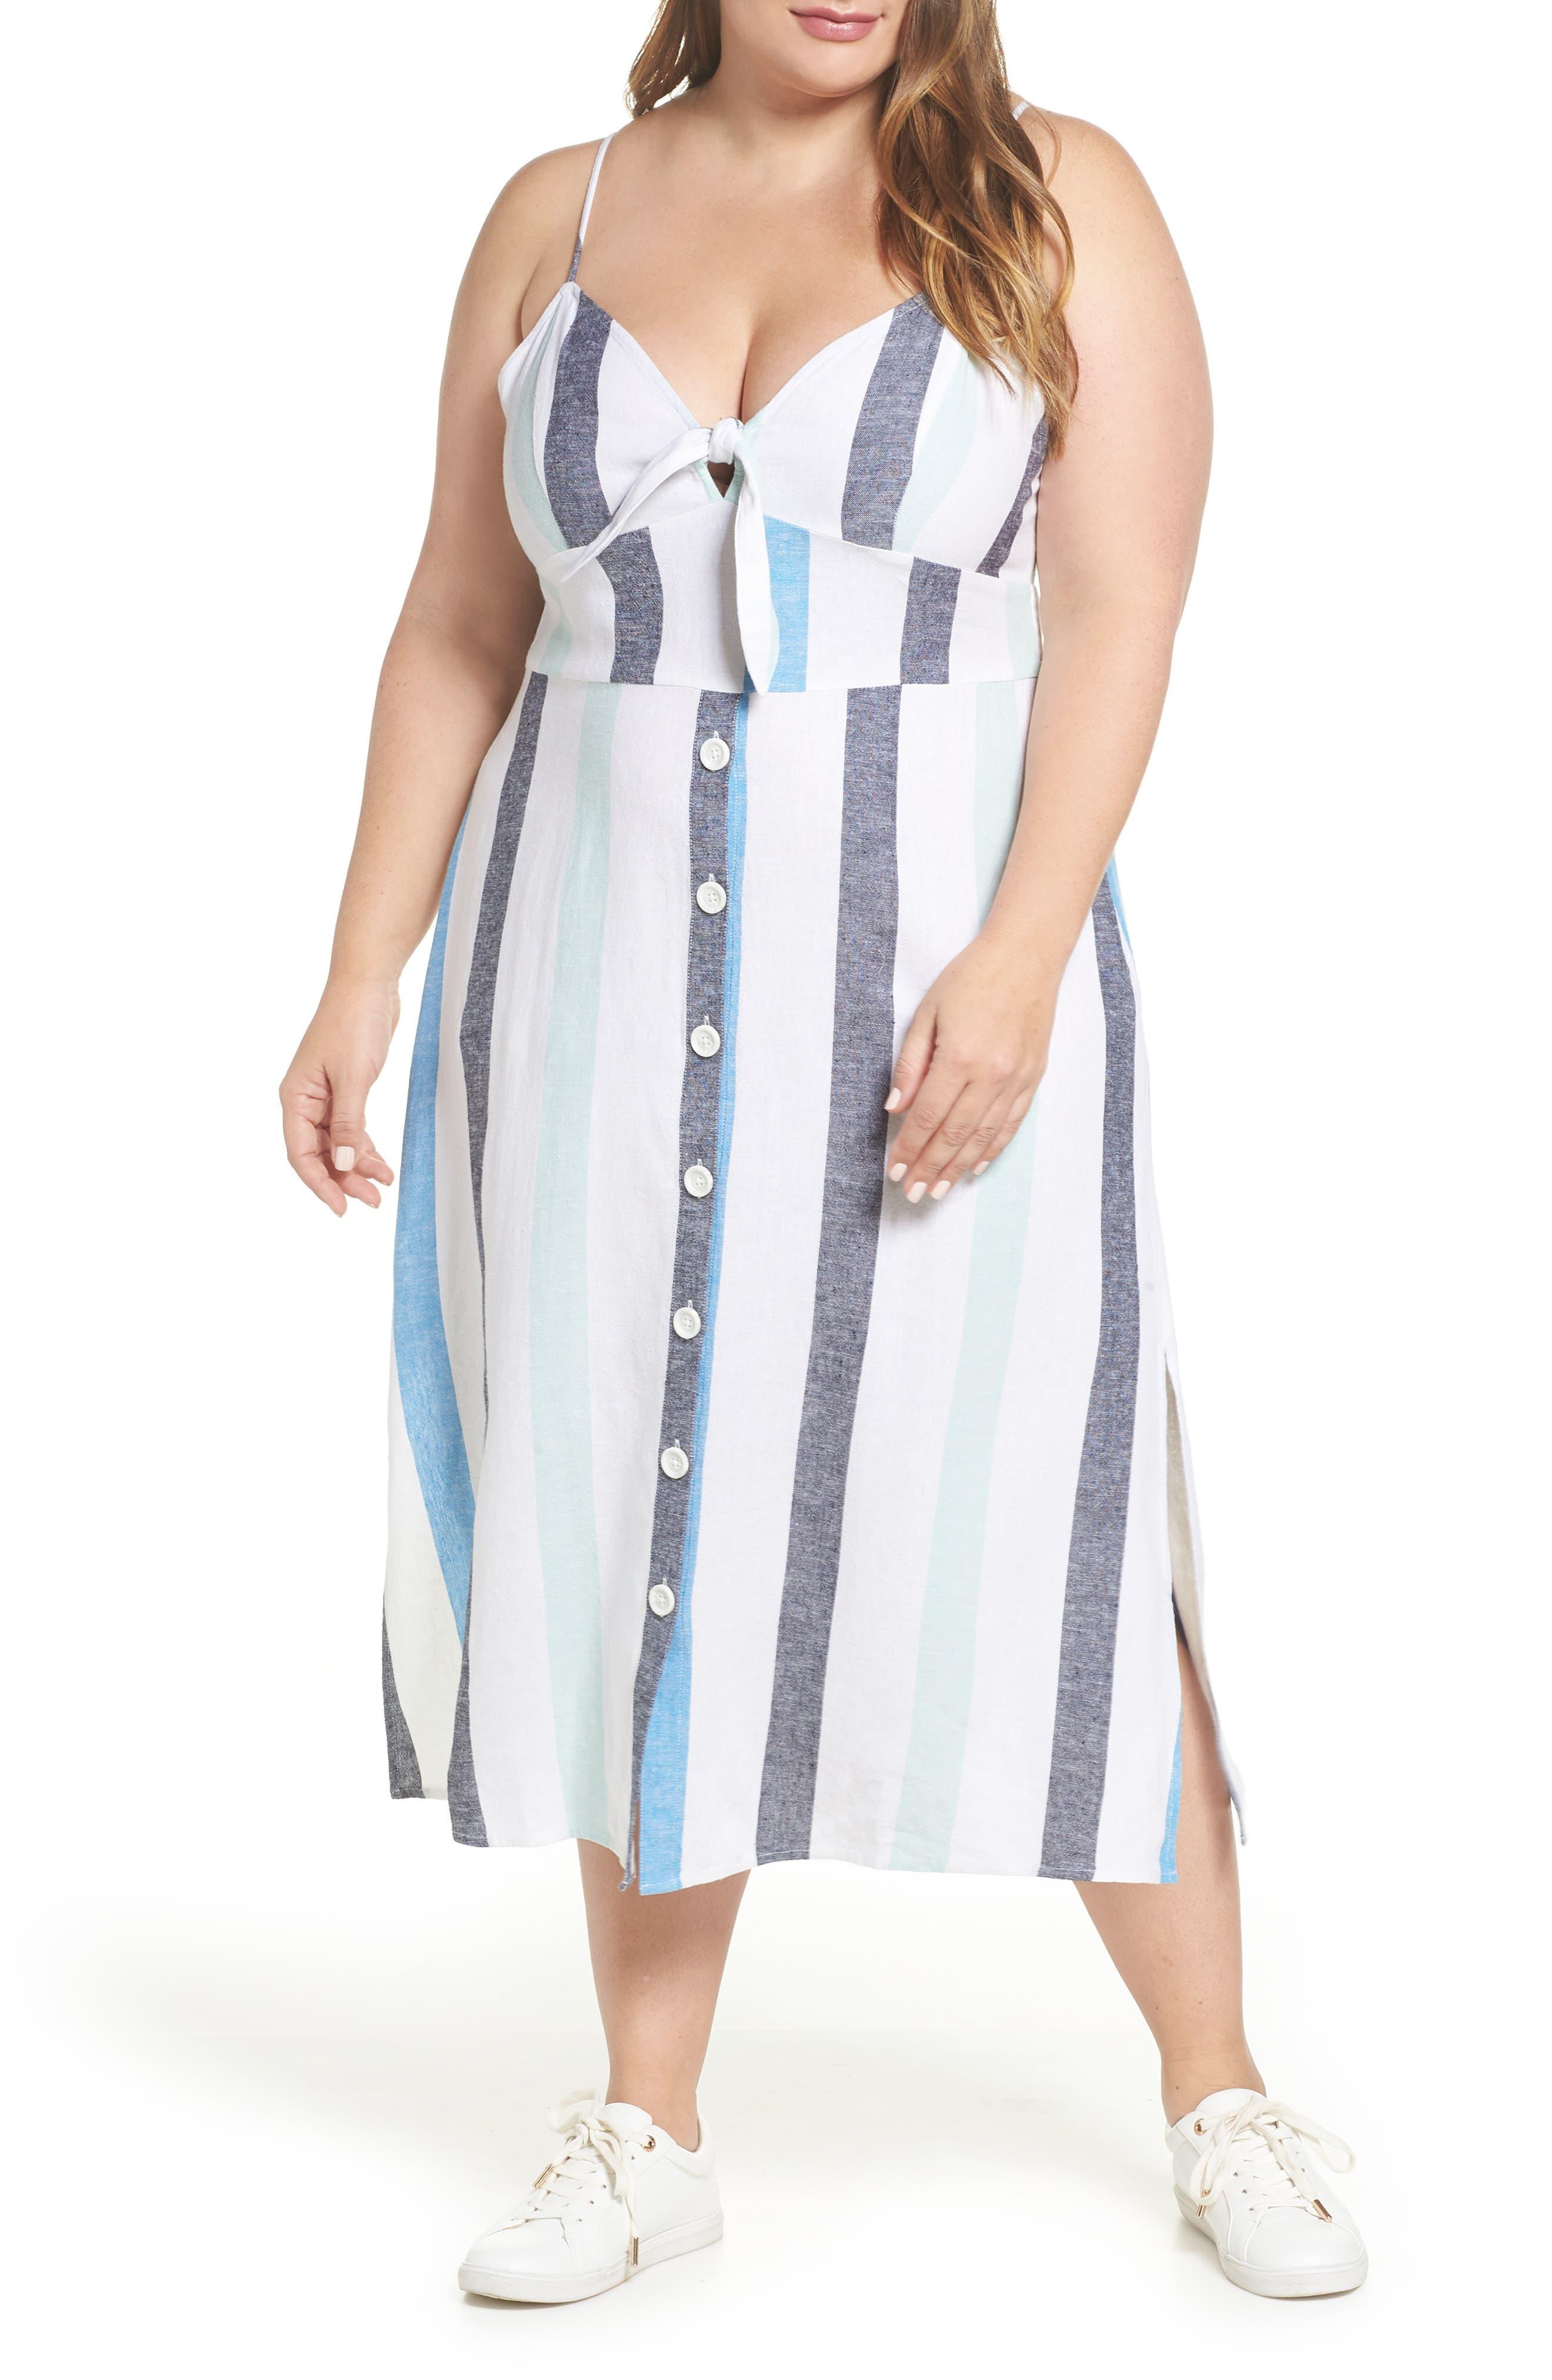 BP., Stripe Sundress, Alternate thumbnail 2, color, BLUE PLACID LACY STRIPE